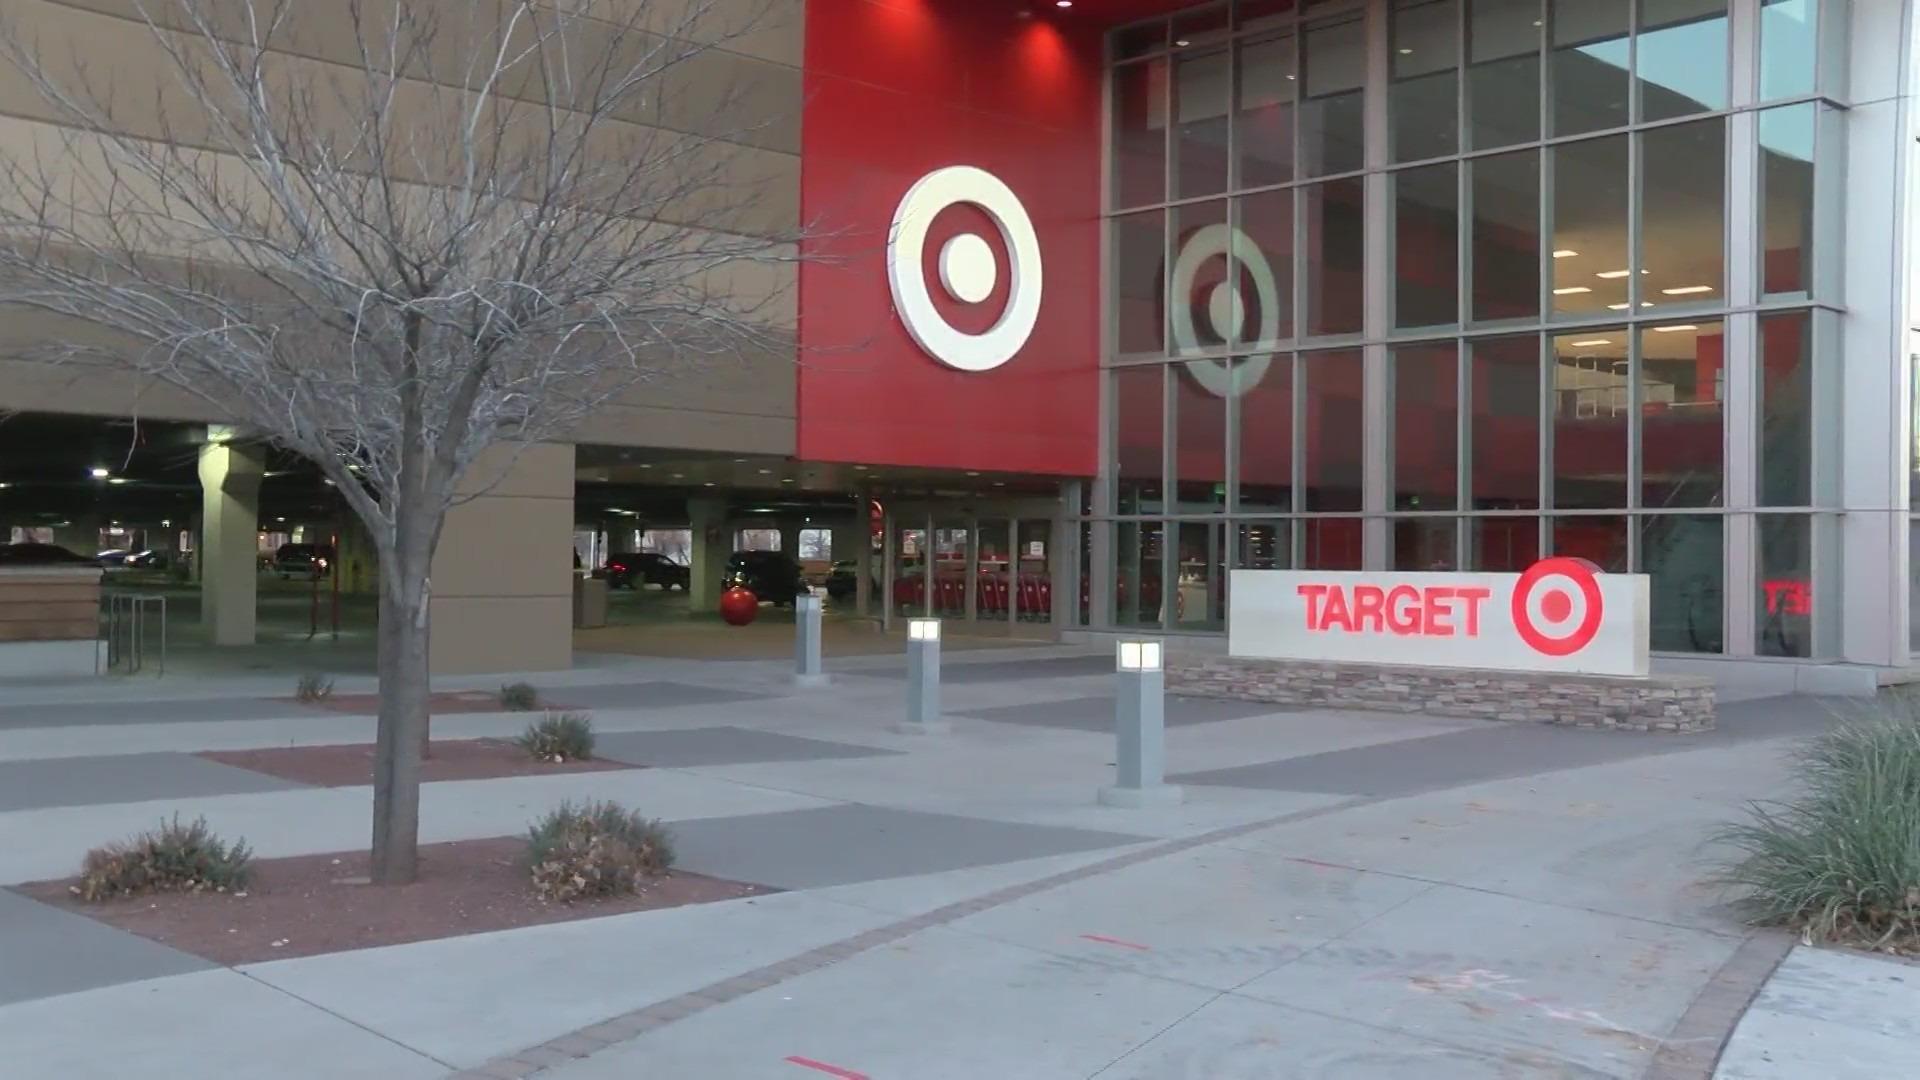 target in uptown albuquerque to reopen